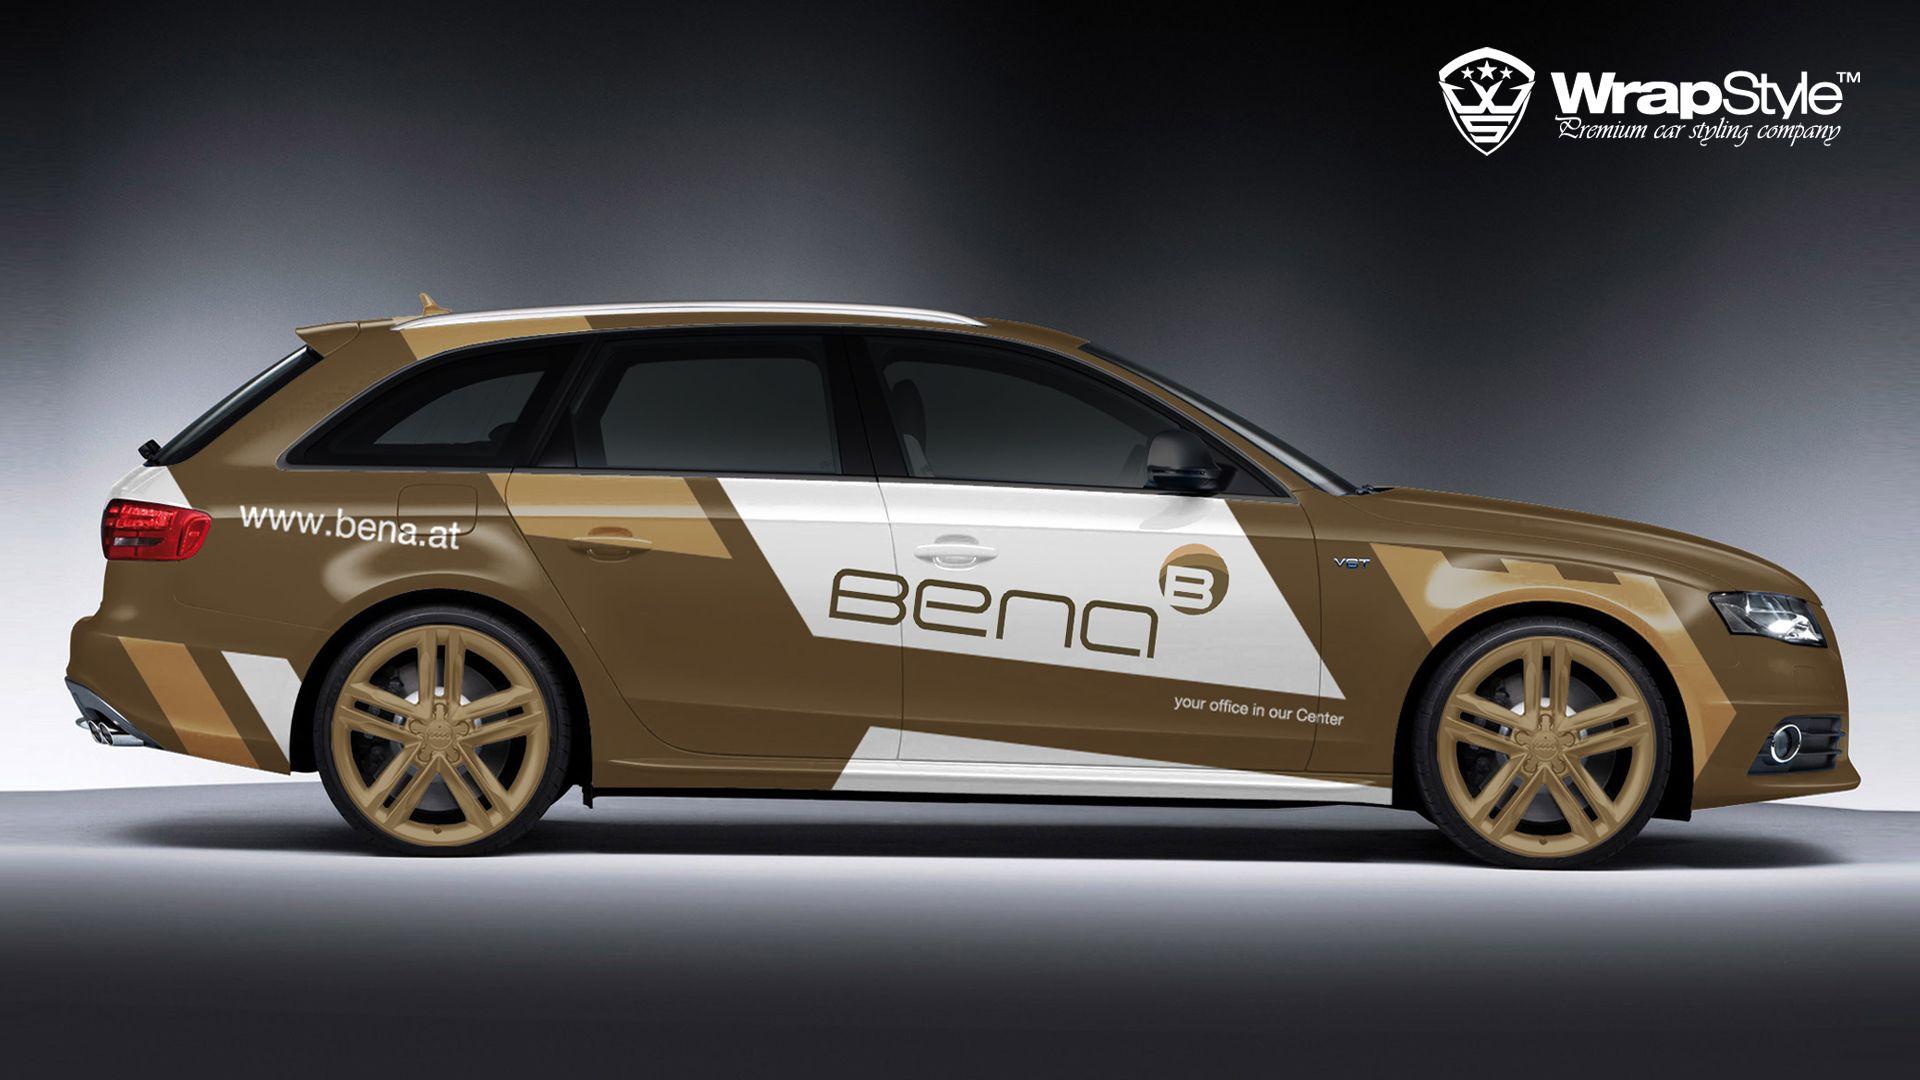 Design car wrap - Cars